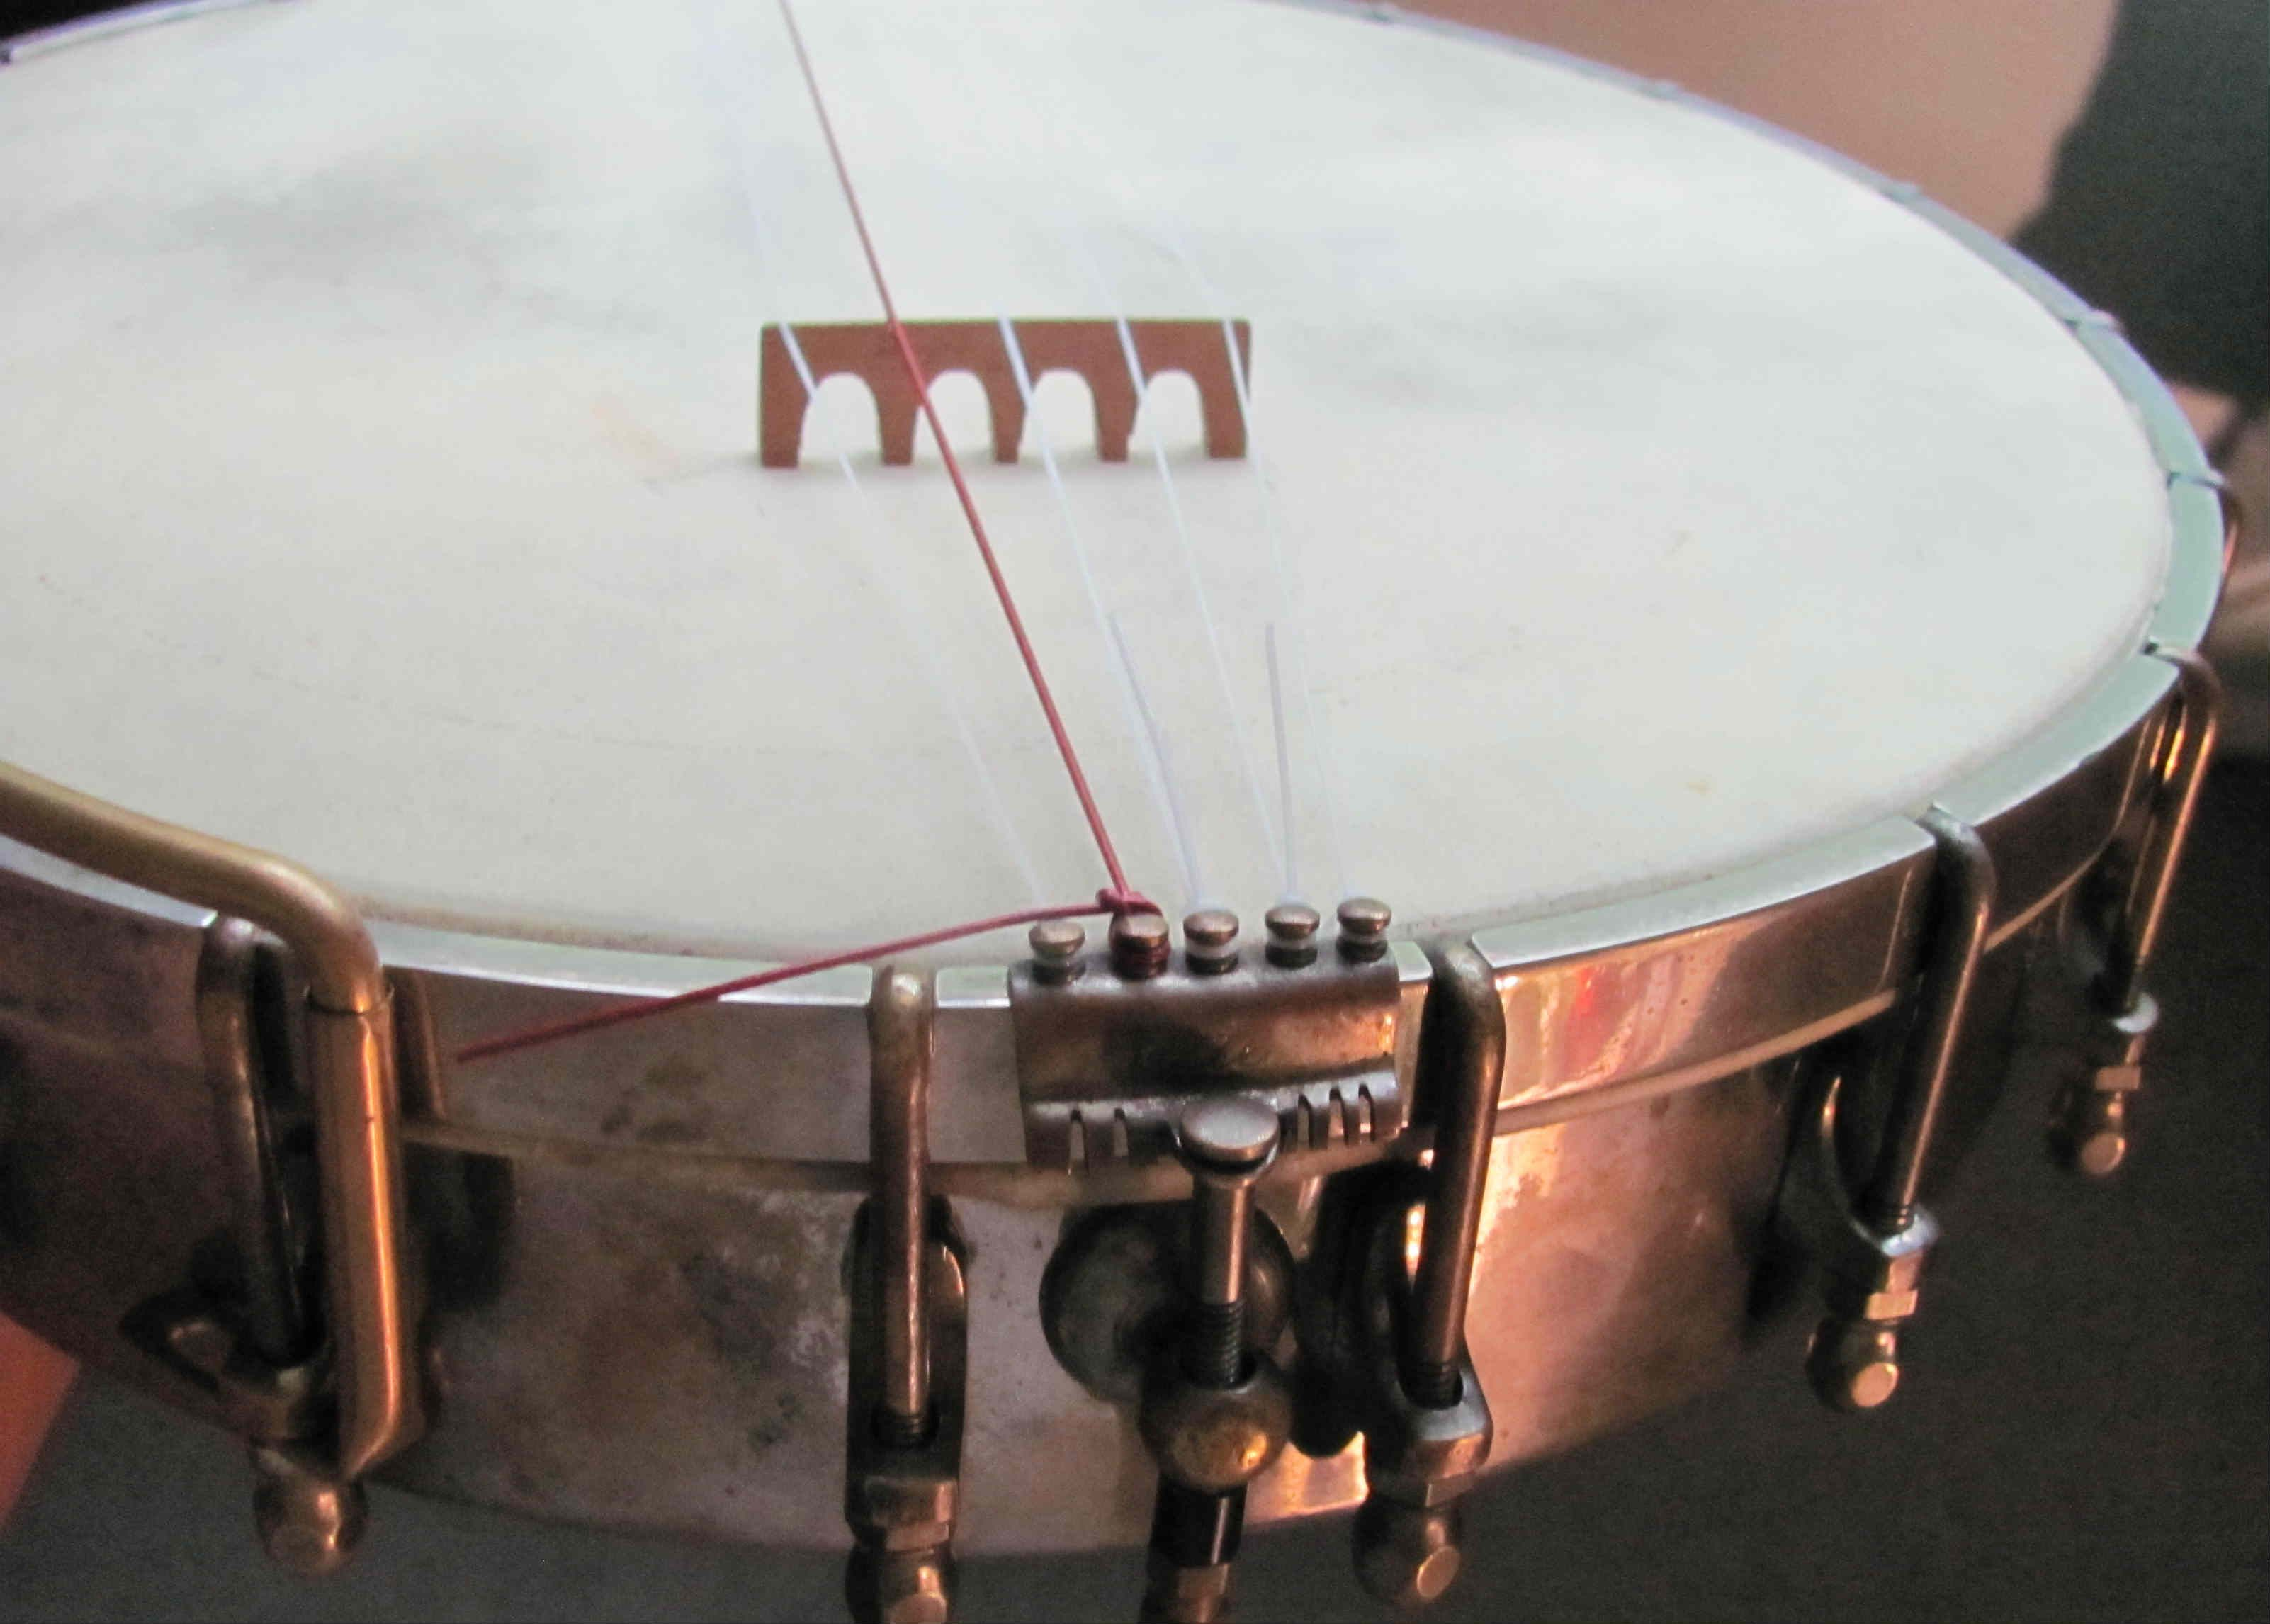 4634607282.jpg 3,204×2,292 pixels Banjo, Music instruments